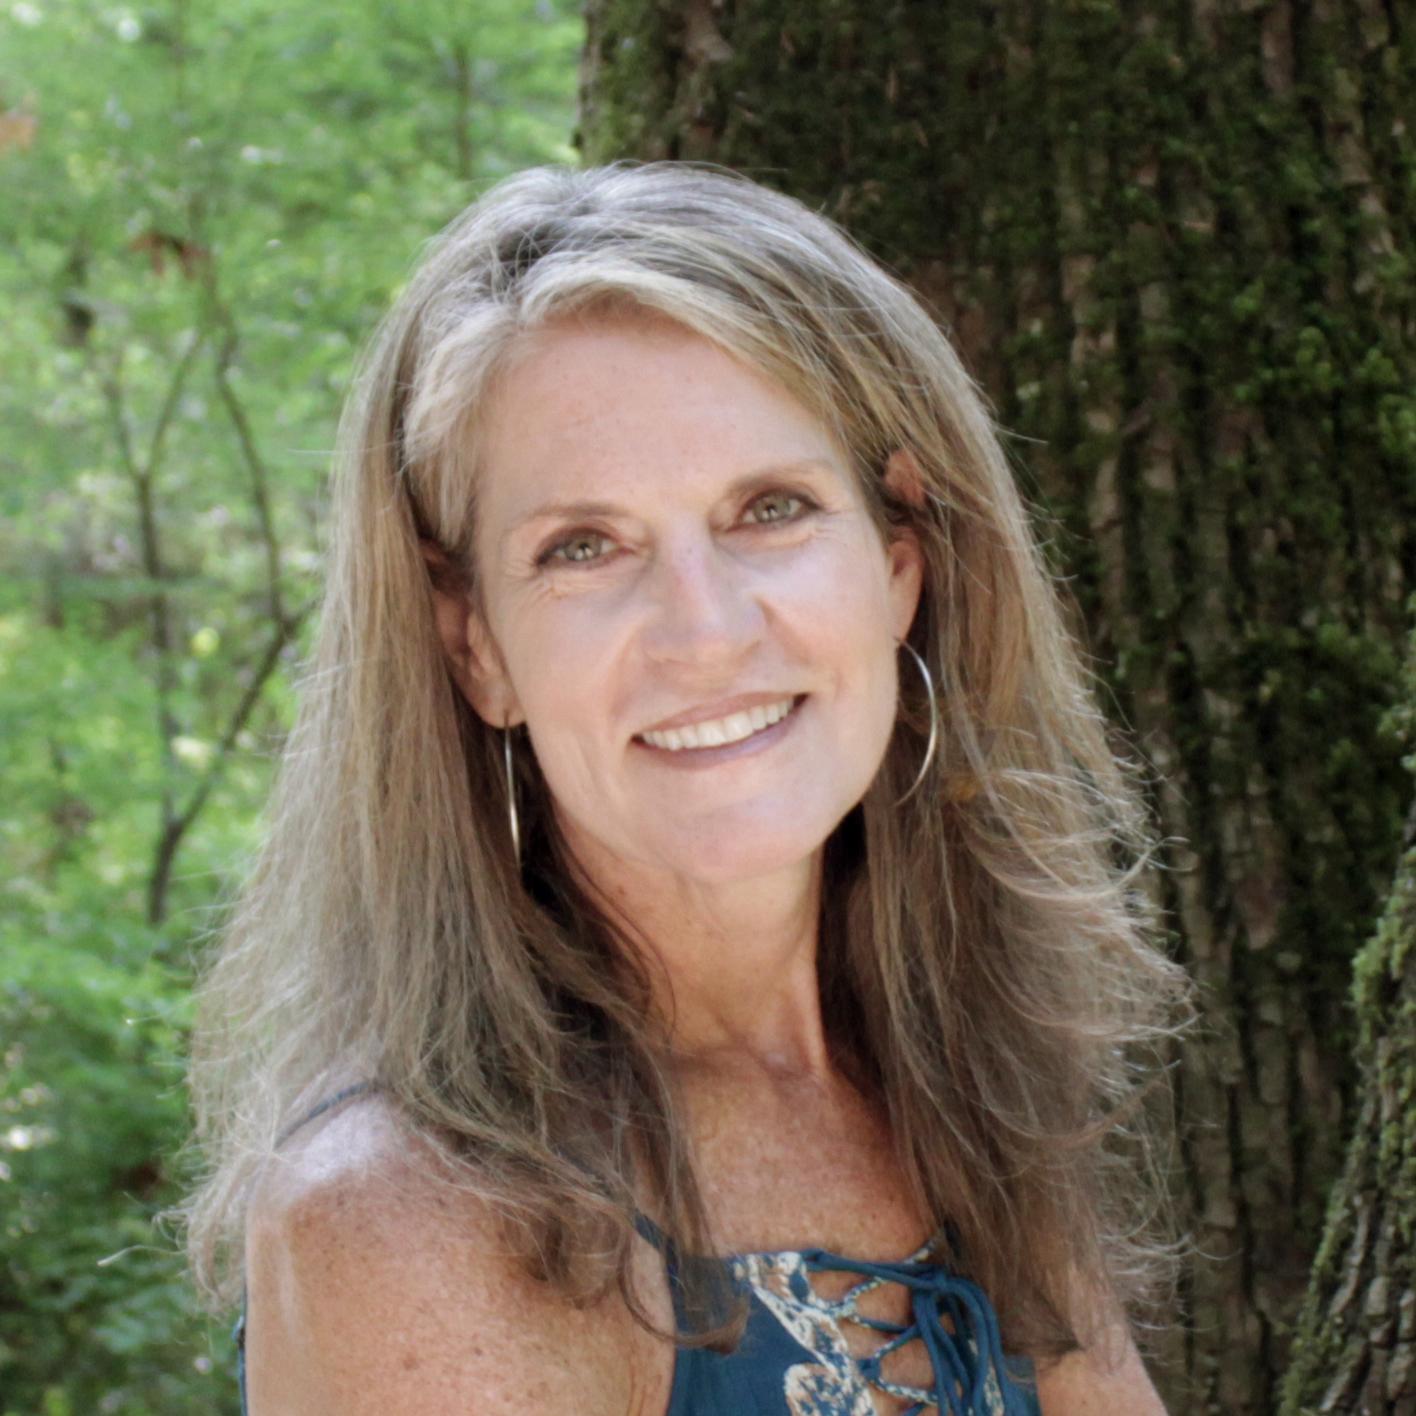 Margie Segress, MA, LMHC, NCC